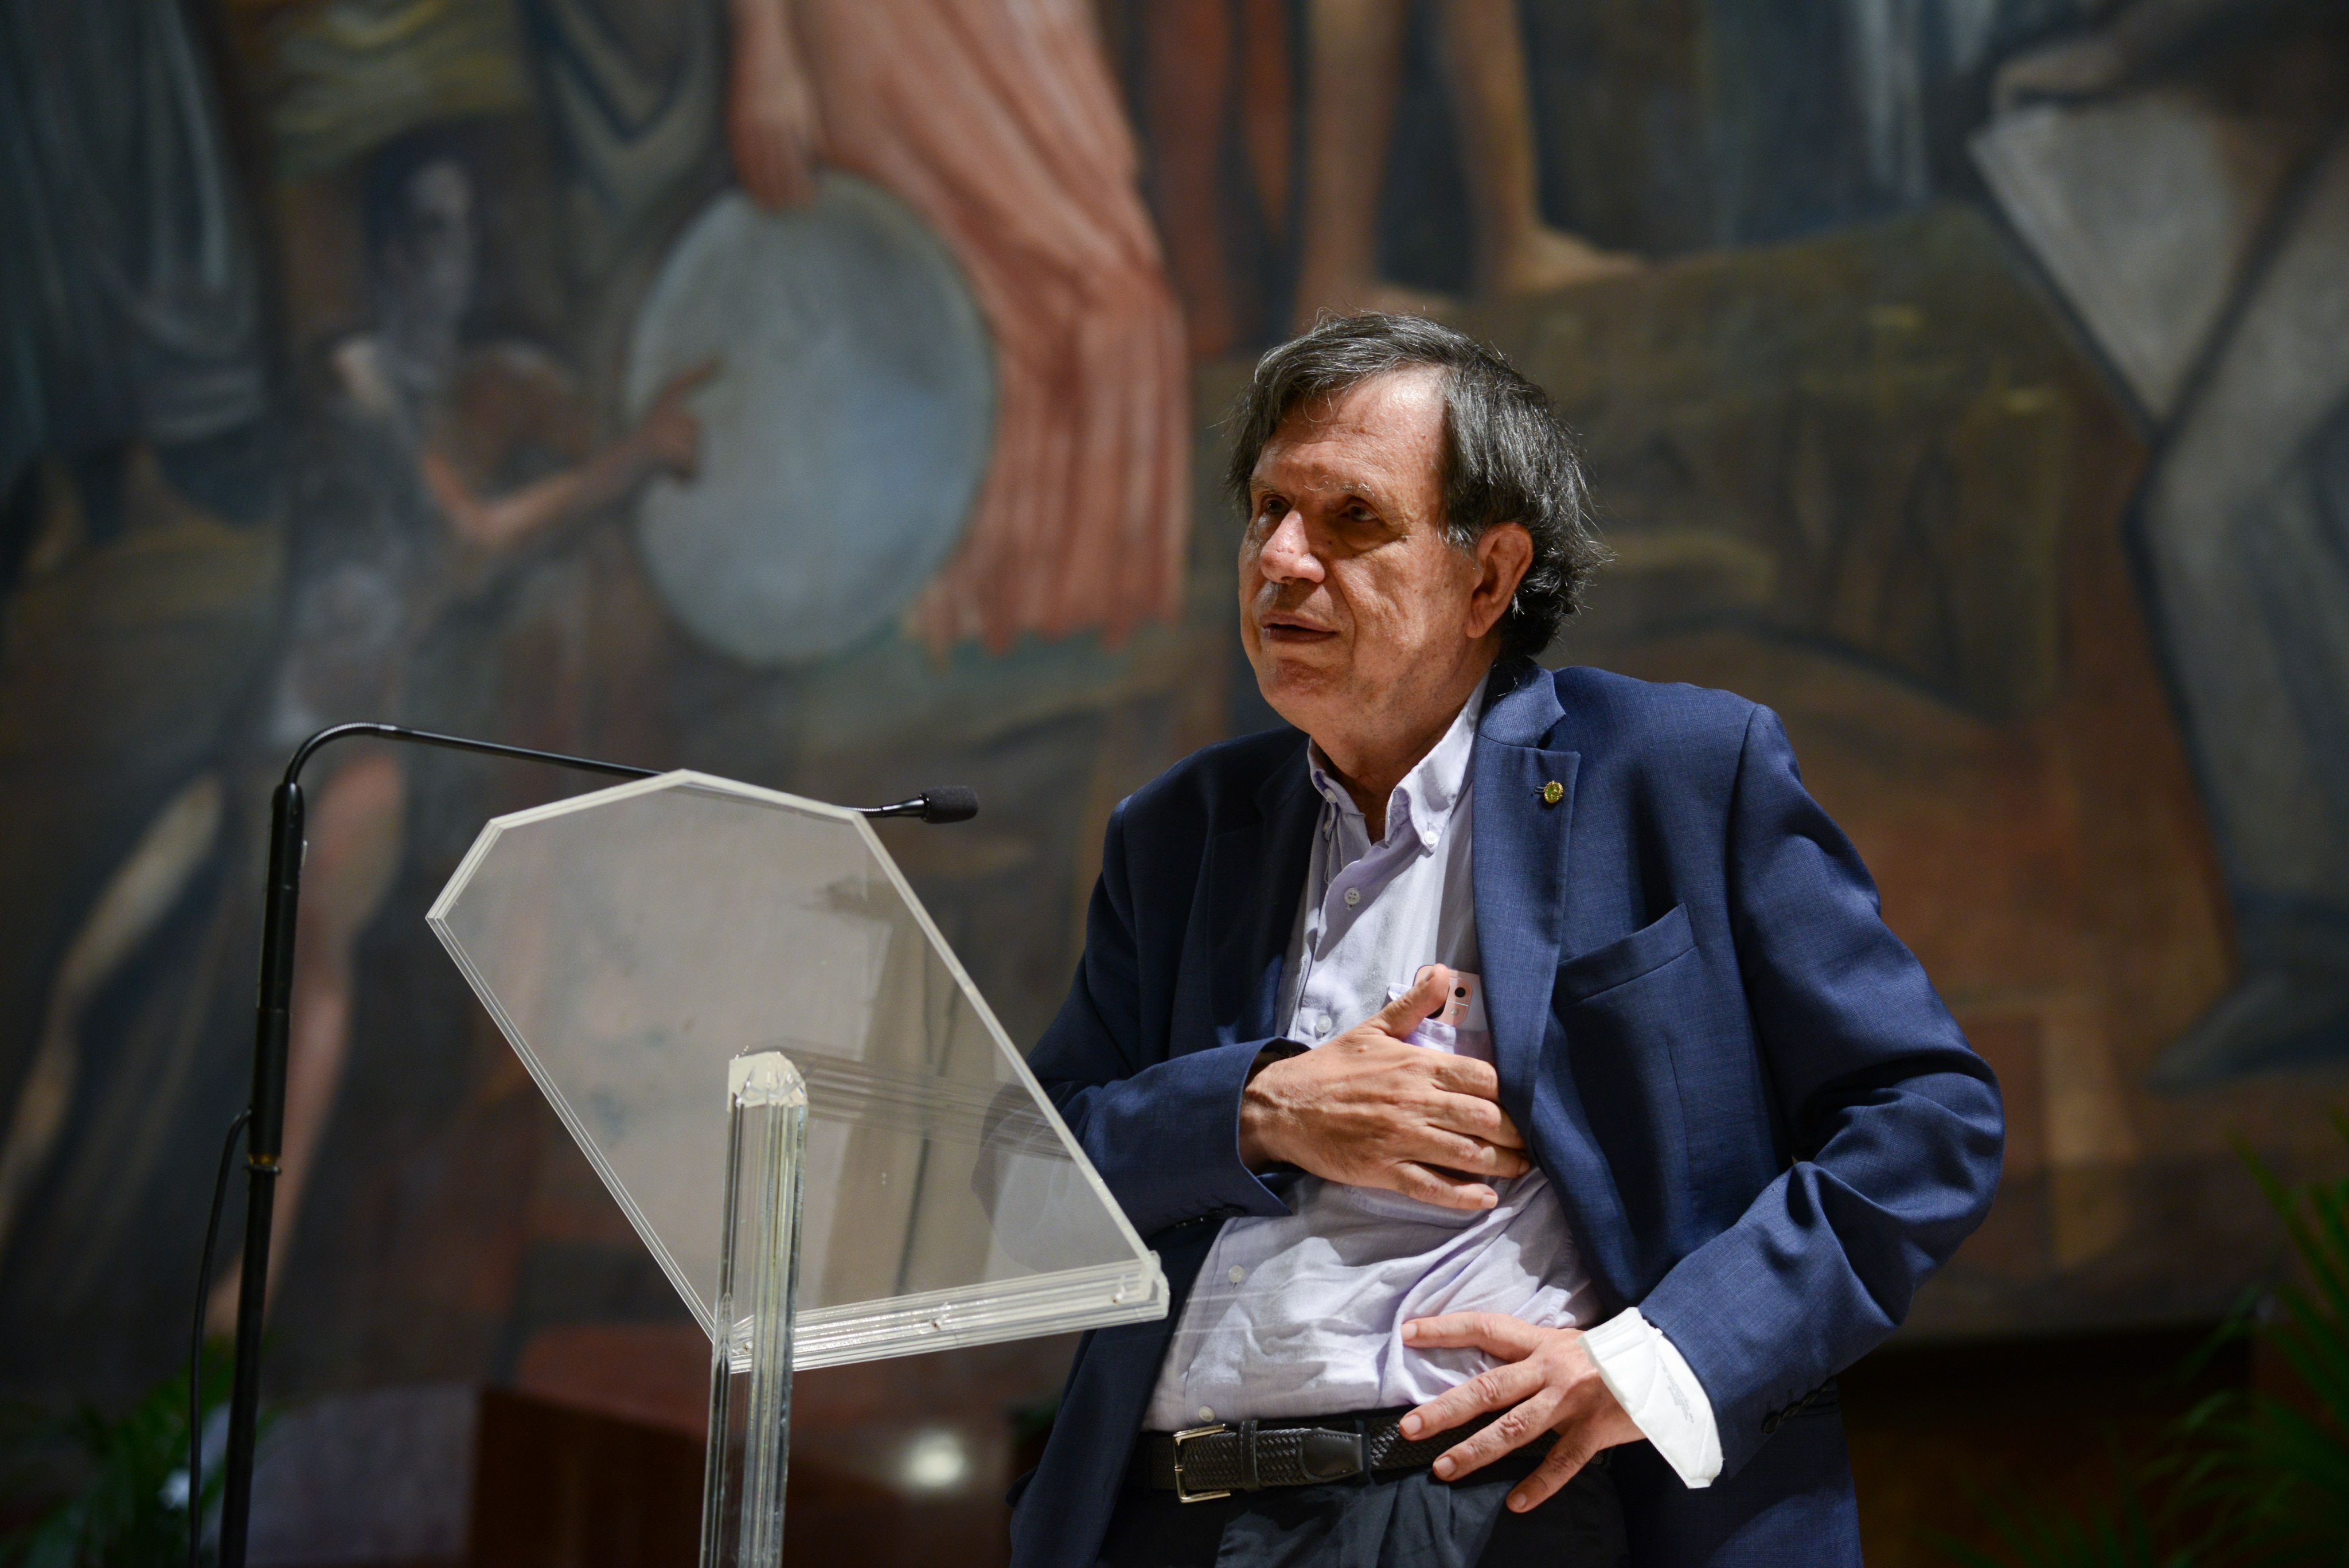 Professor Giorgio Parisi meets university professors and students on 5 of October, 2021 at the La Sapienza University in Rome, Italy.